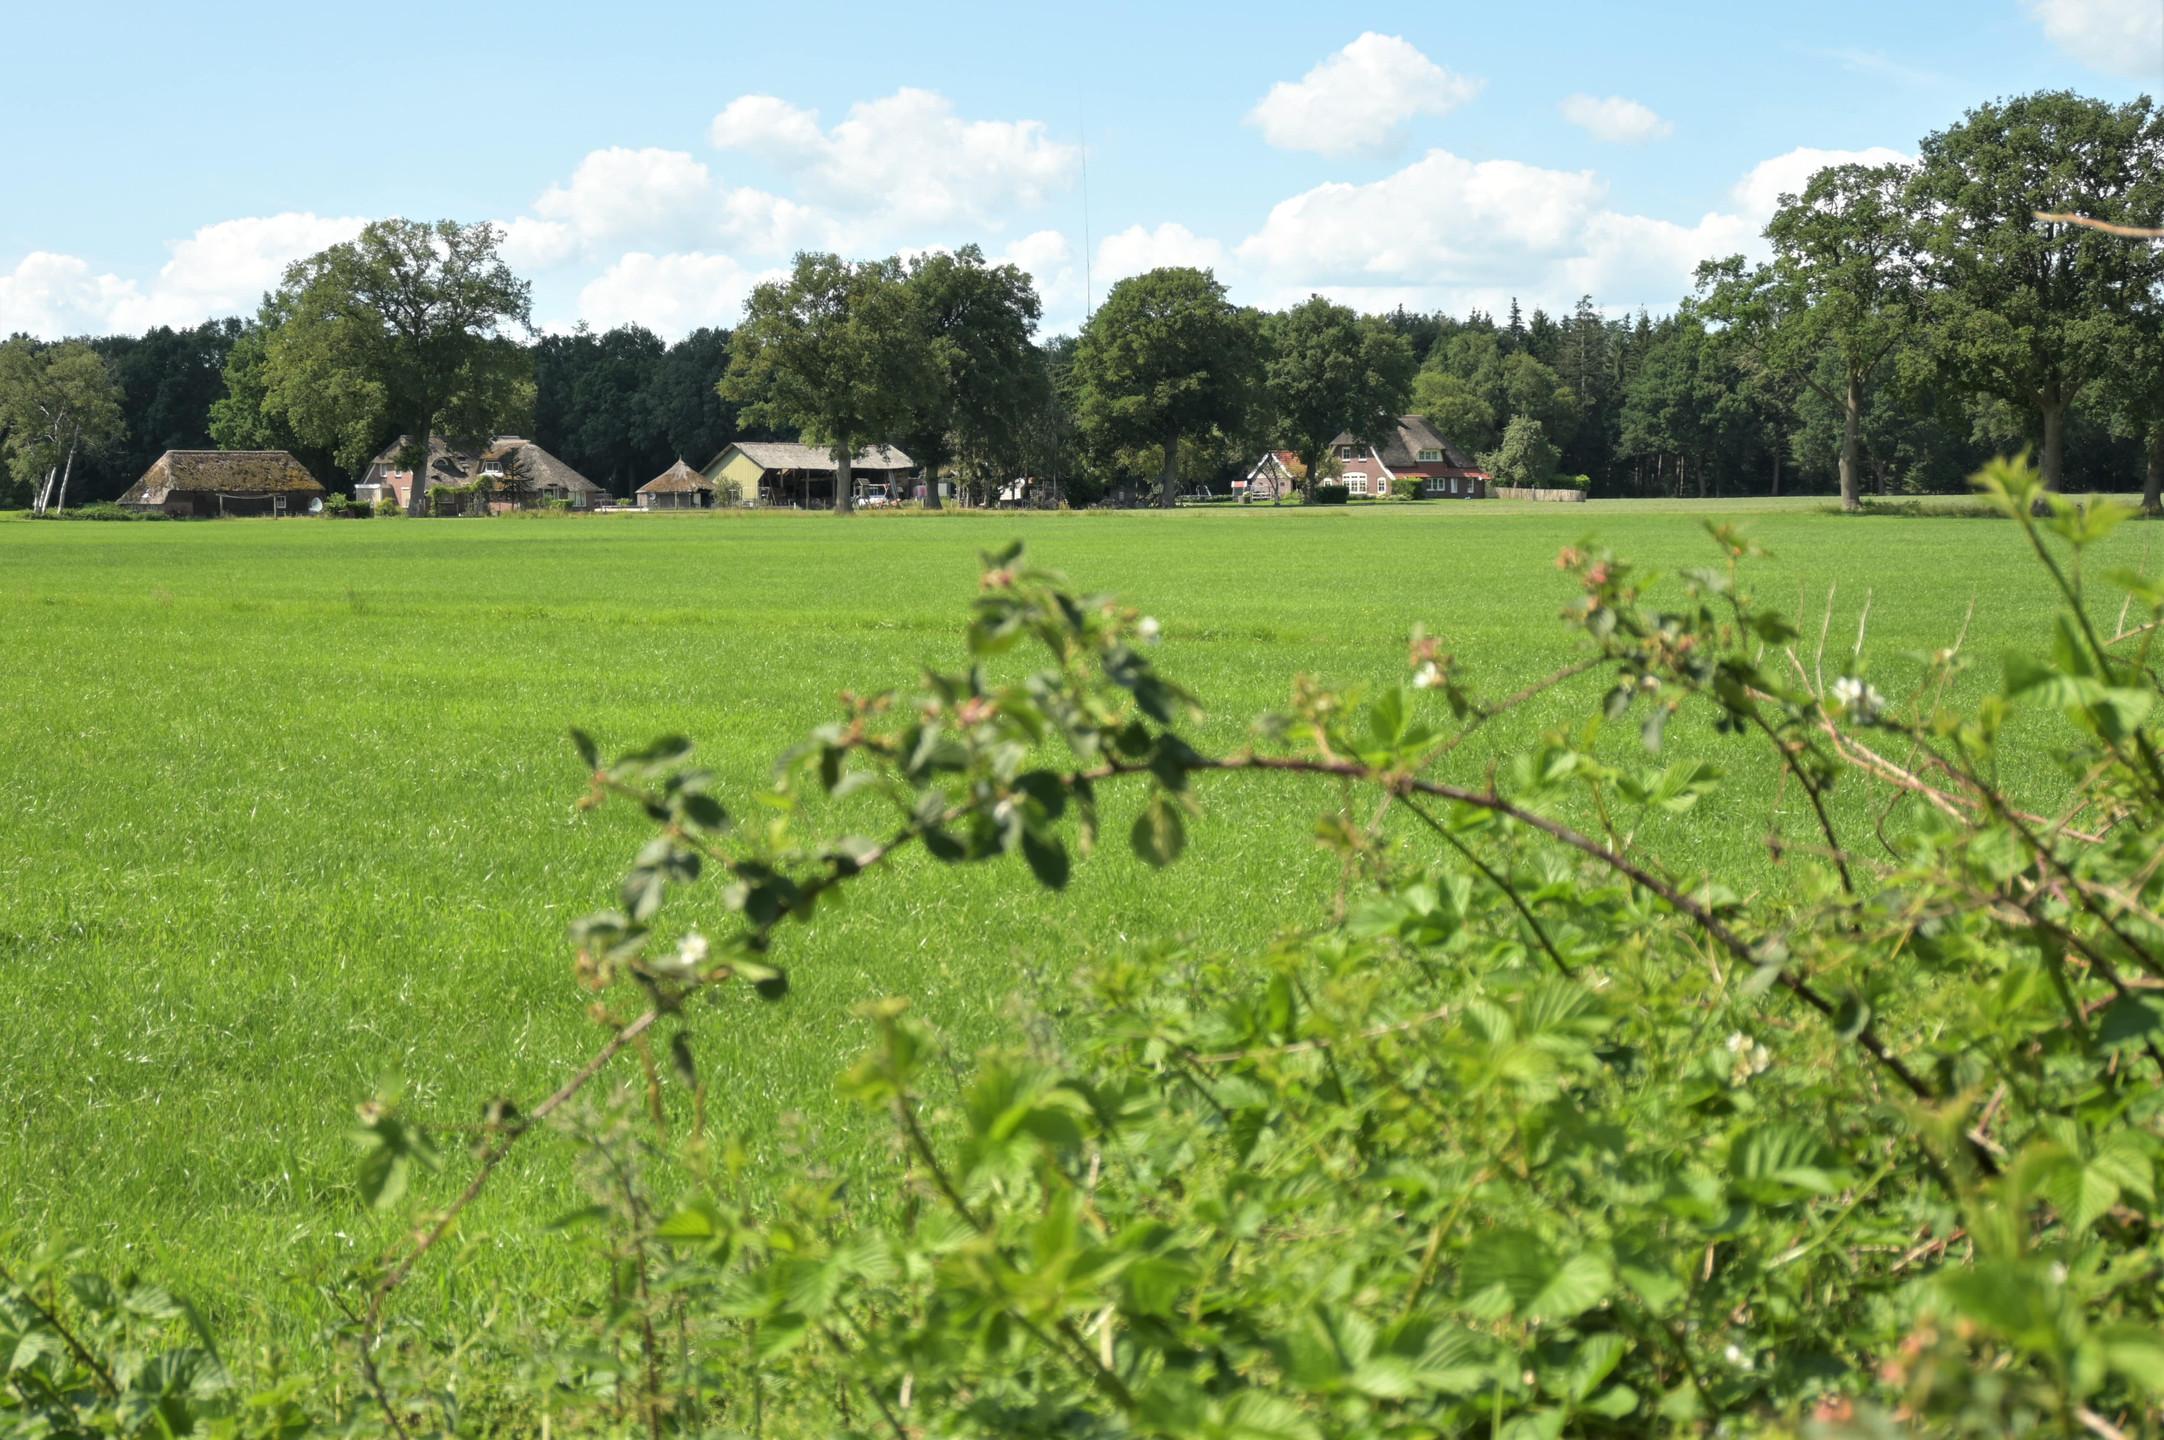 Countryside Overijssel - the Netherlands